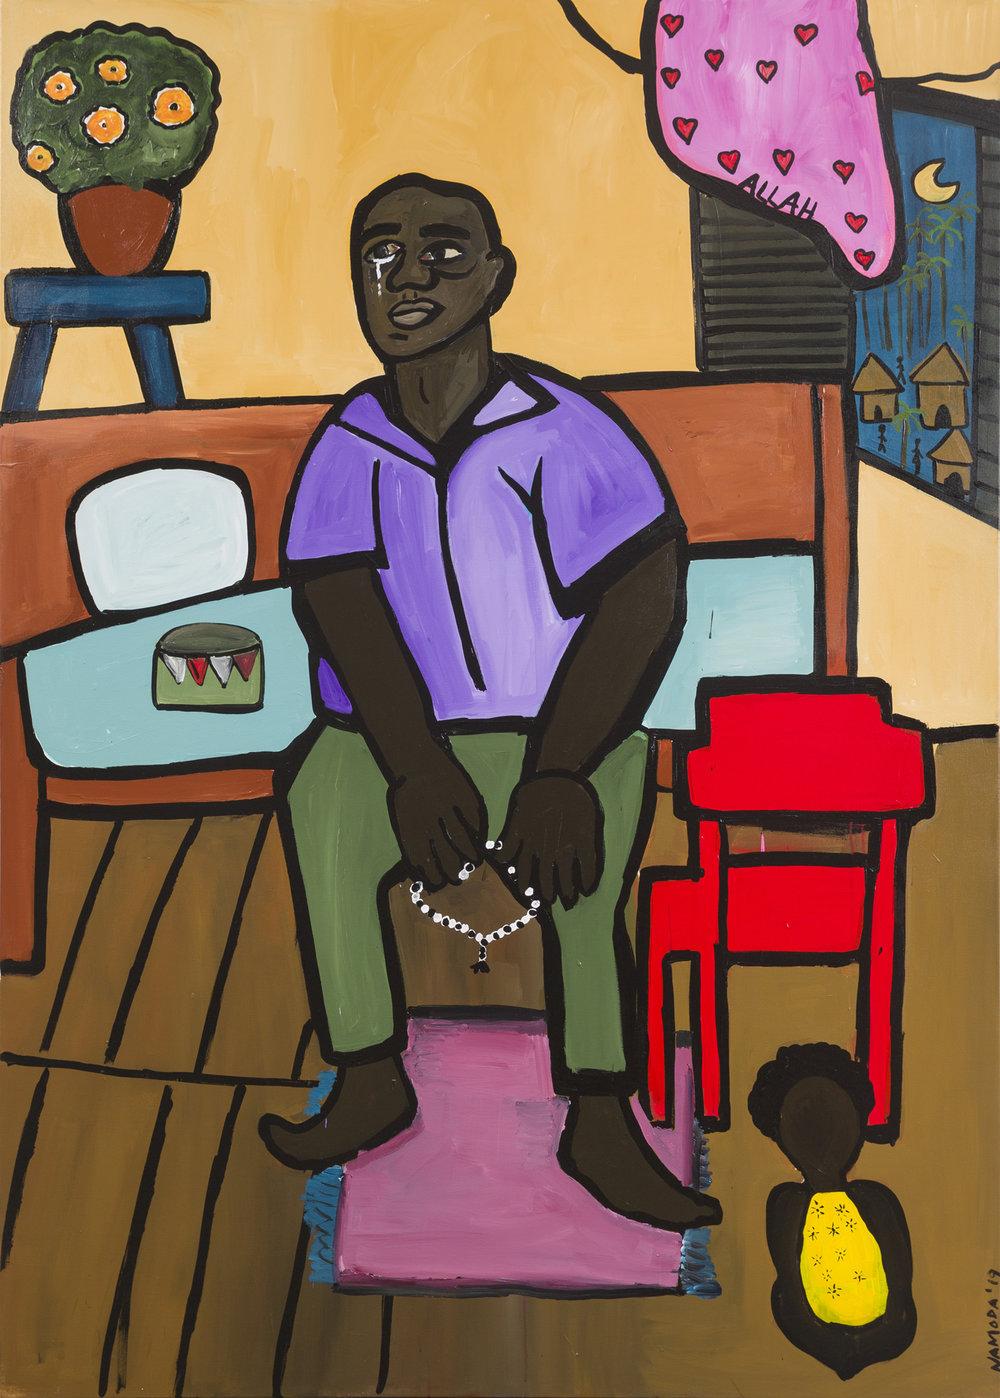 Cassi Namoda   Quarto de Eduardo  2019 Acrylic on canvas 213.4 x 152.4 cm  Available